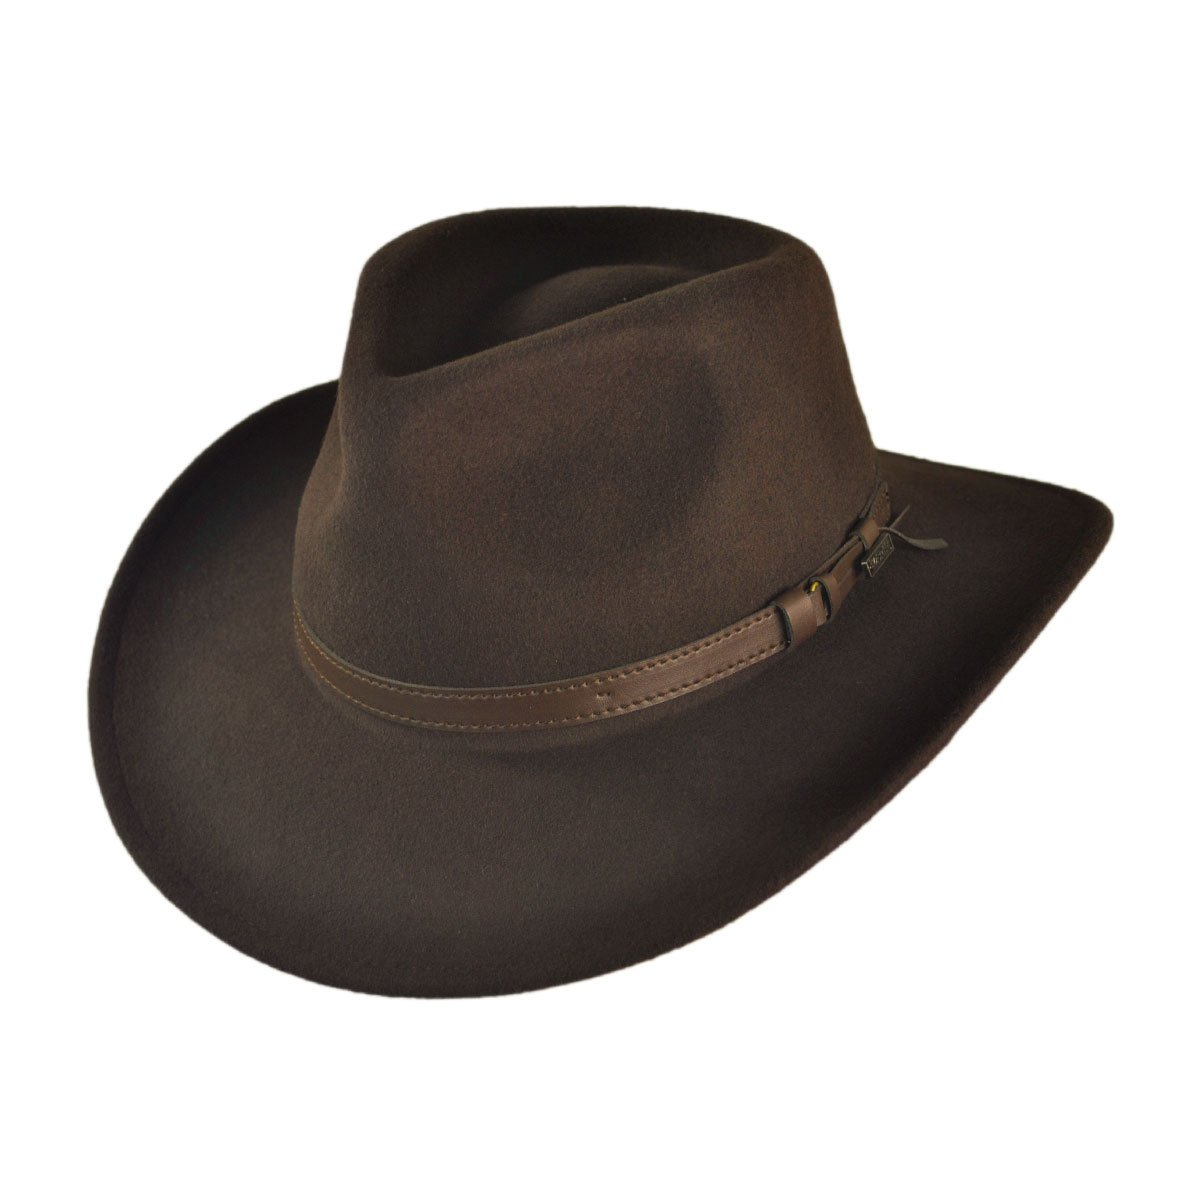 Jaxon Outback Crushable (Medium, Brown)